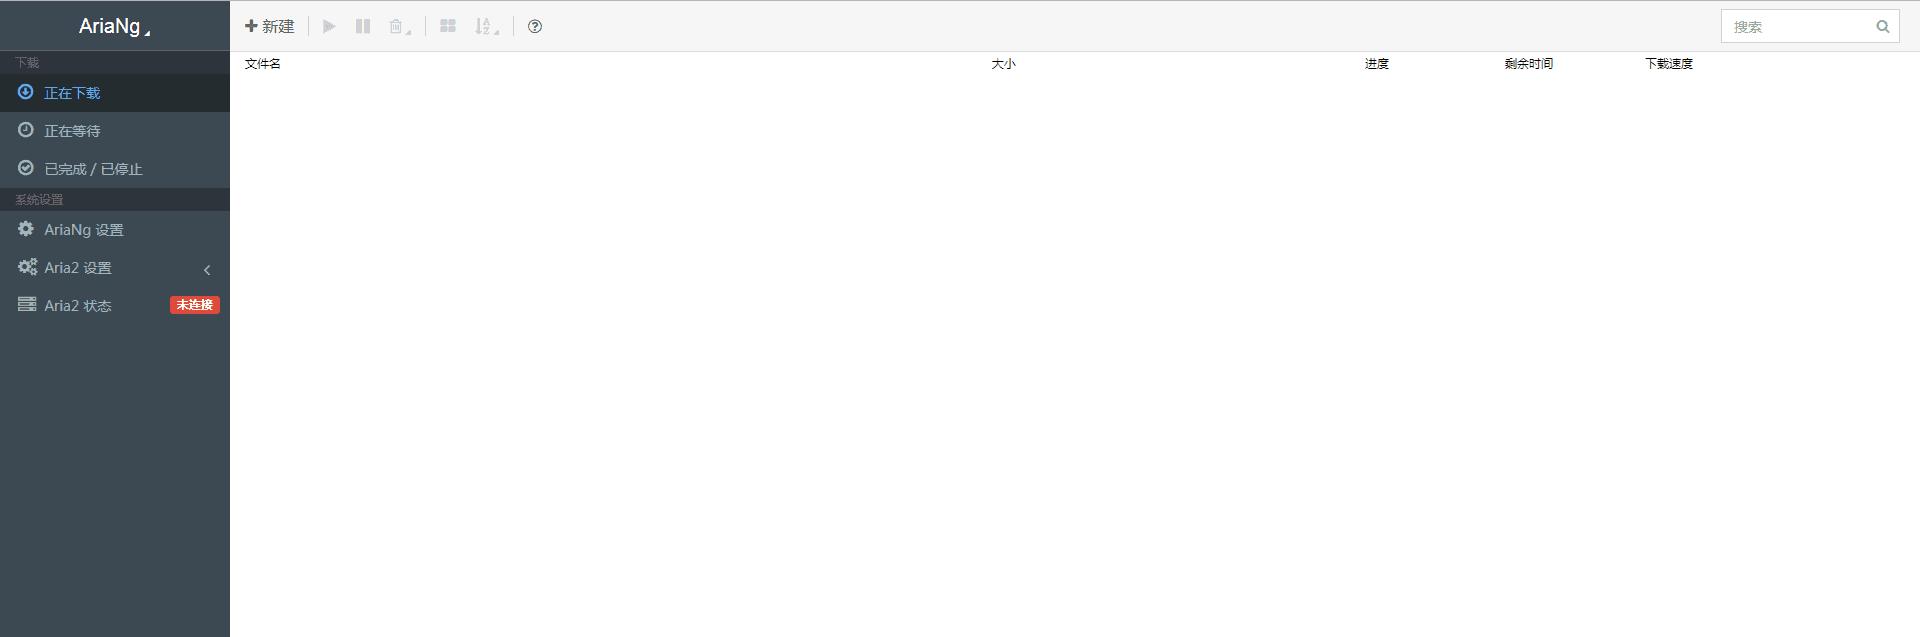 TIM截图20180204024139.png